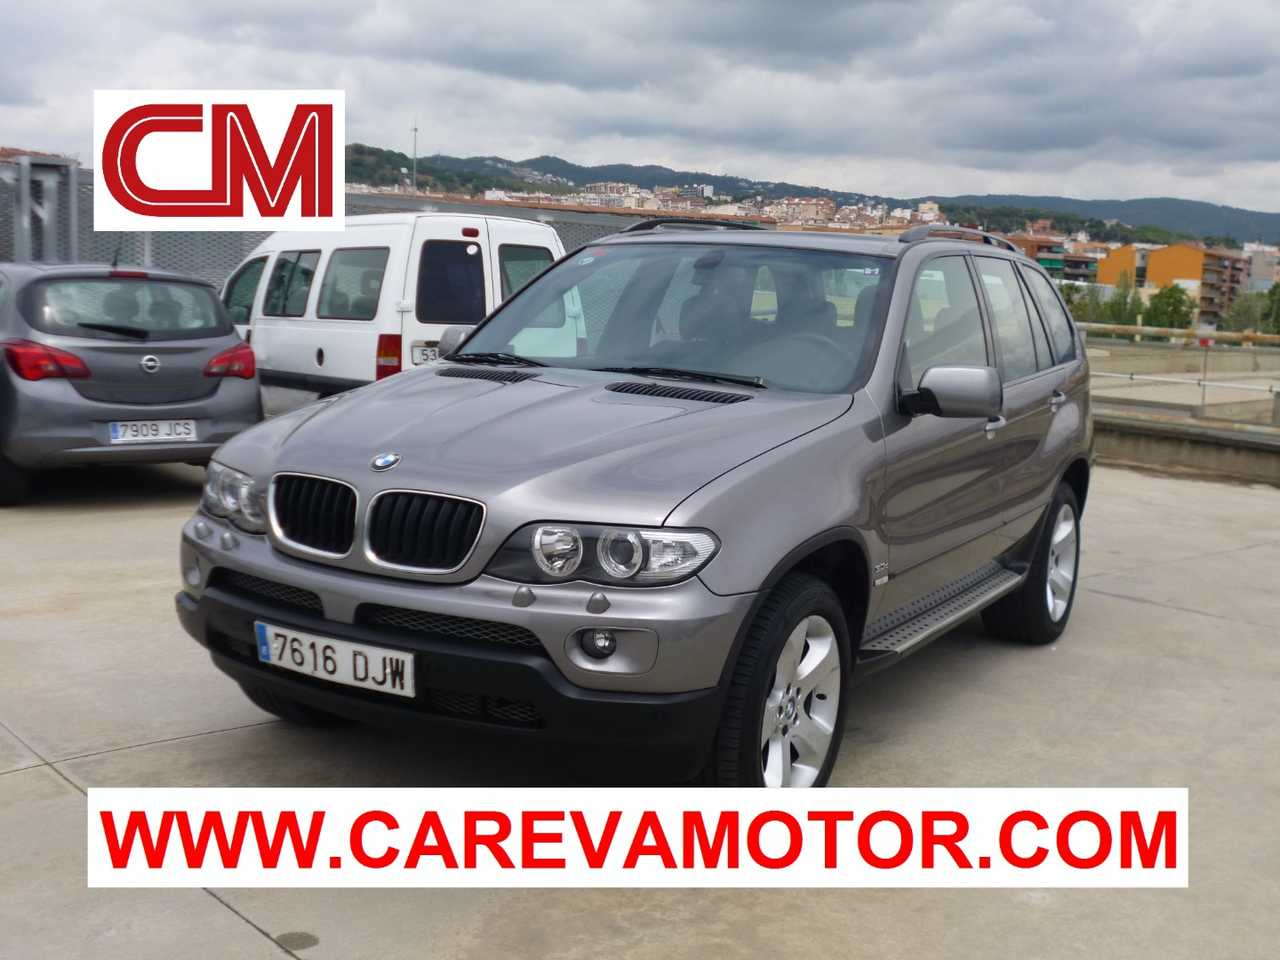 BMW X5 3.0D 217CV SPORT PACK 5P   - Foto 1